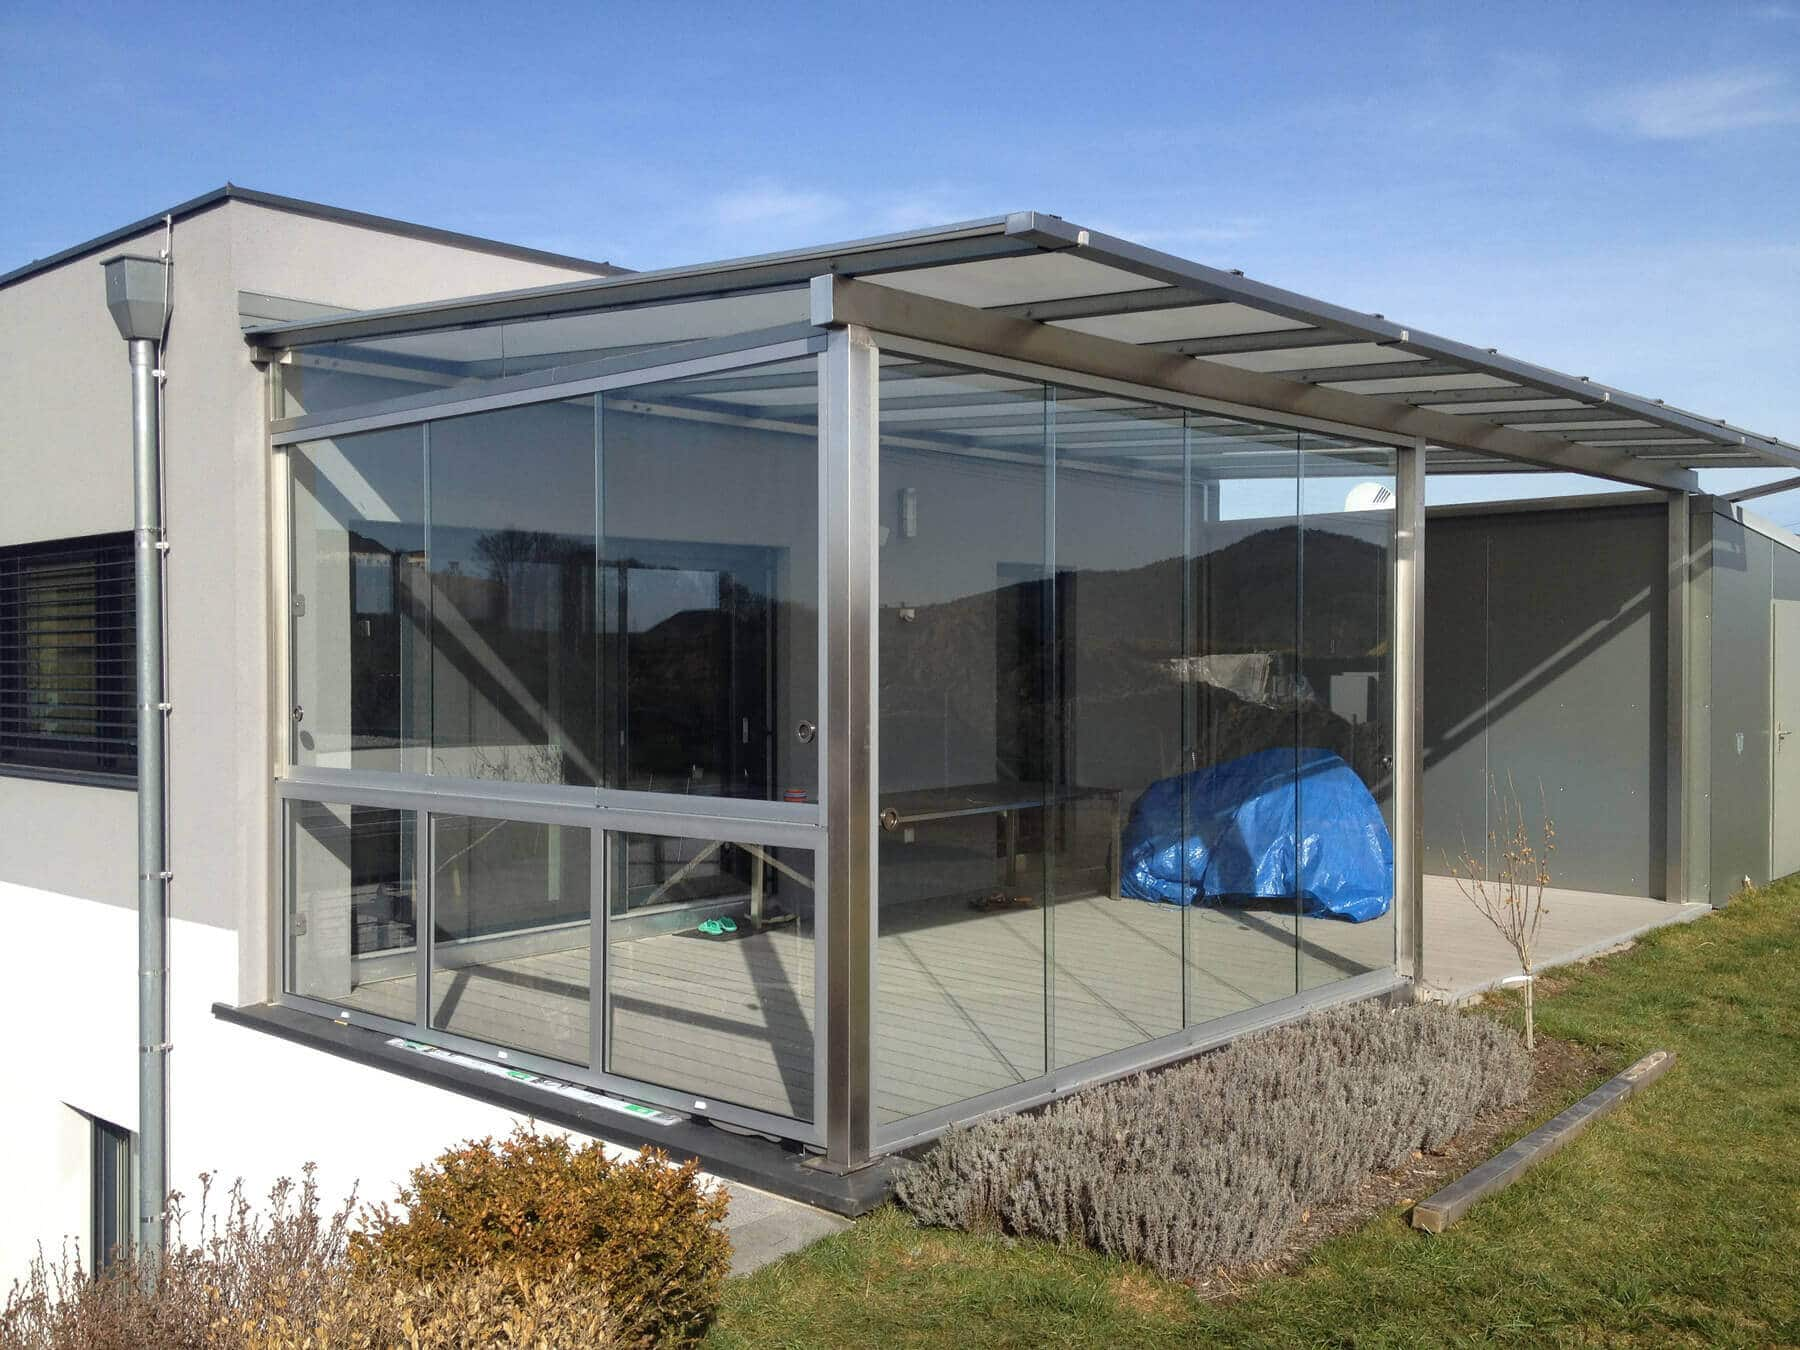 Terrassenüberdachung in Edelstahl Konstruktion